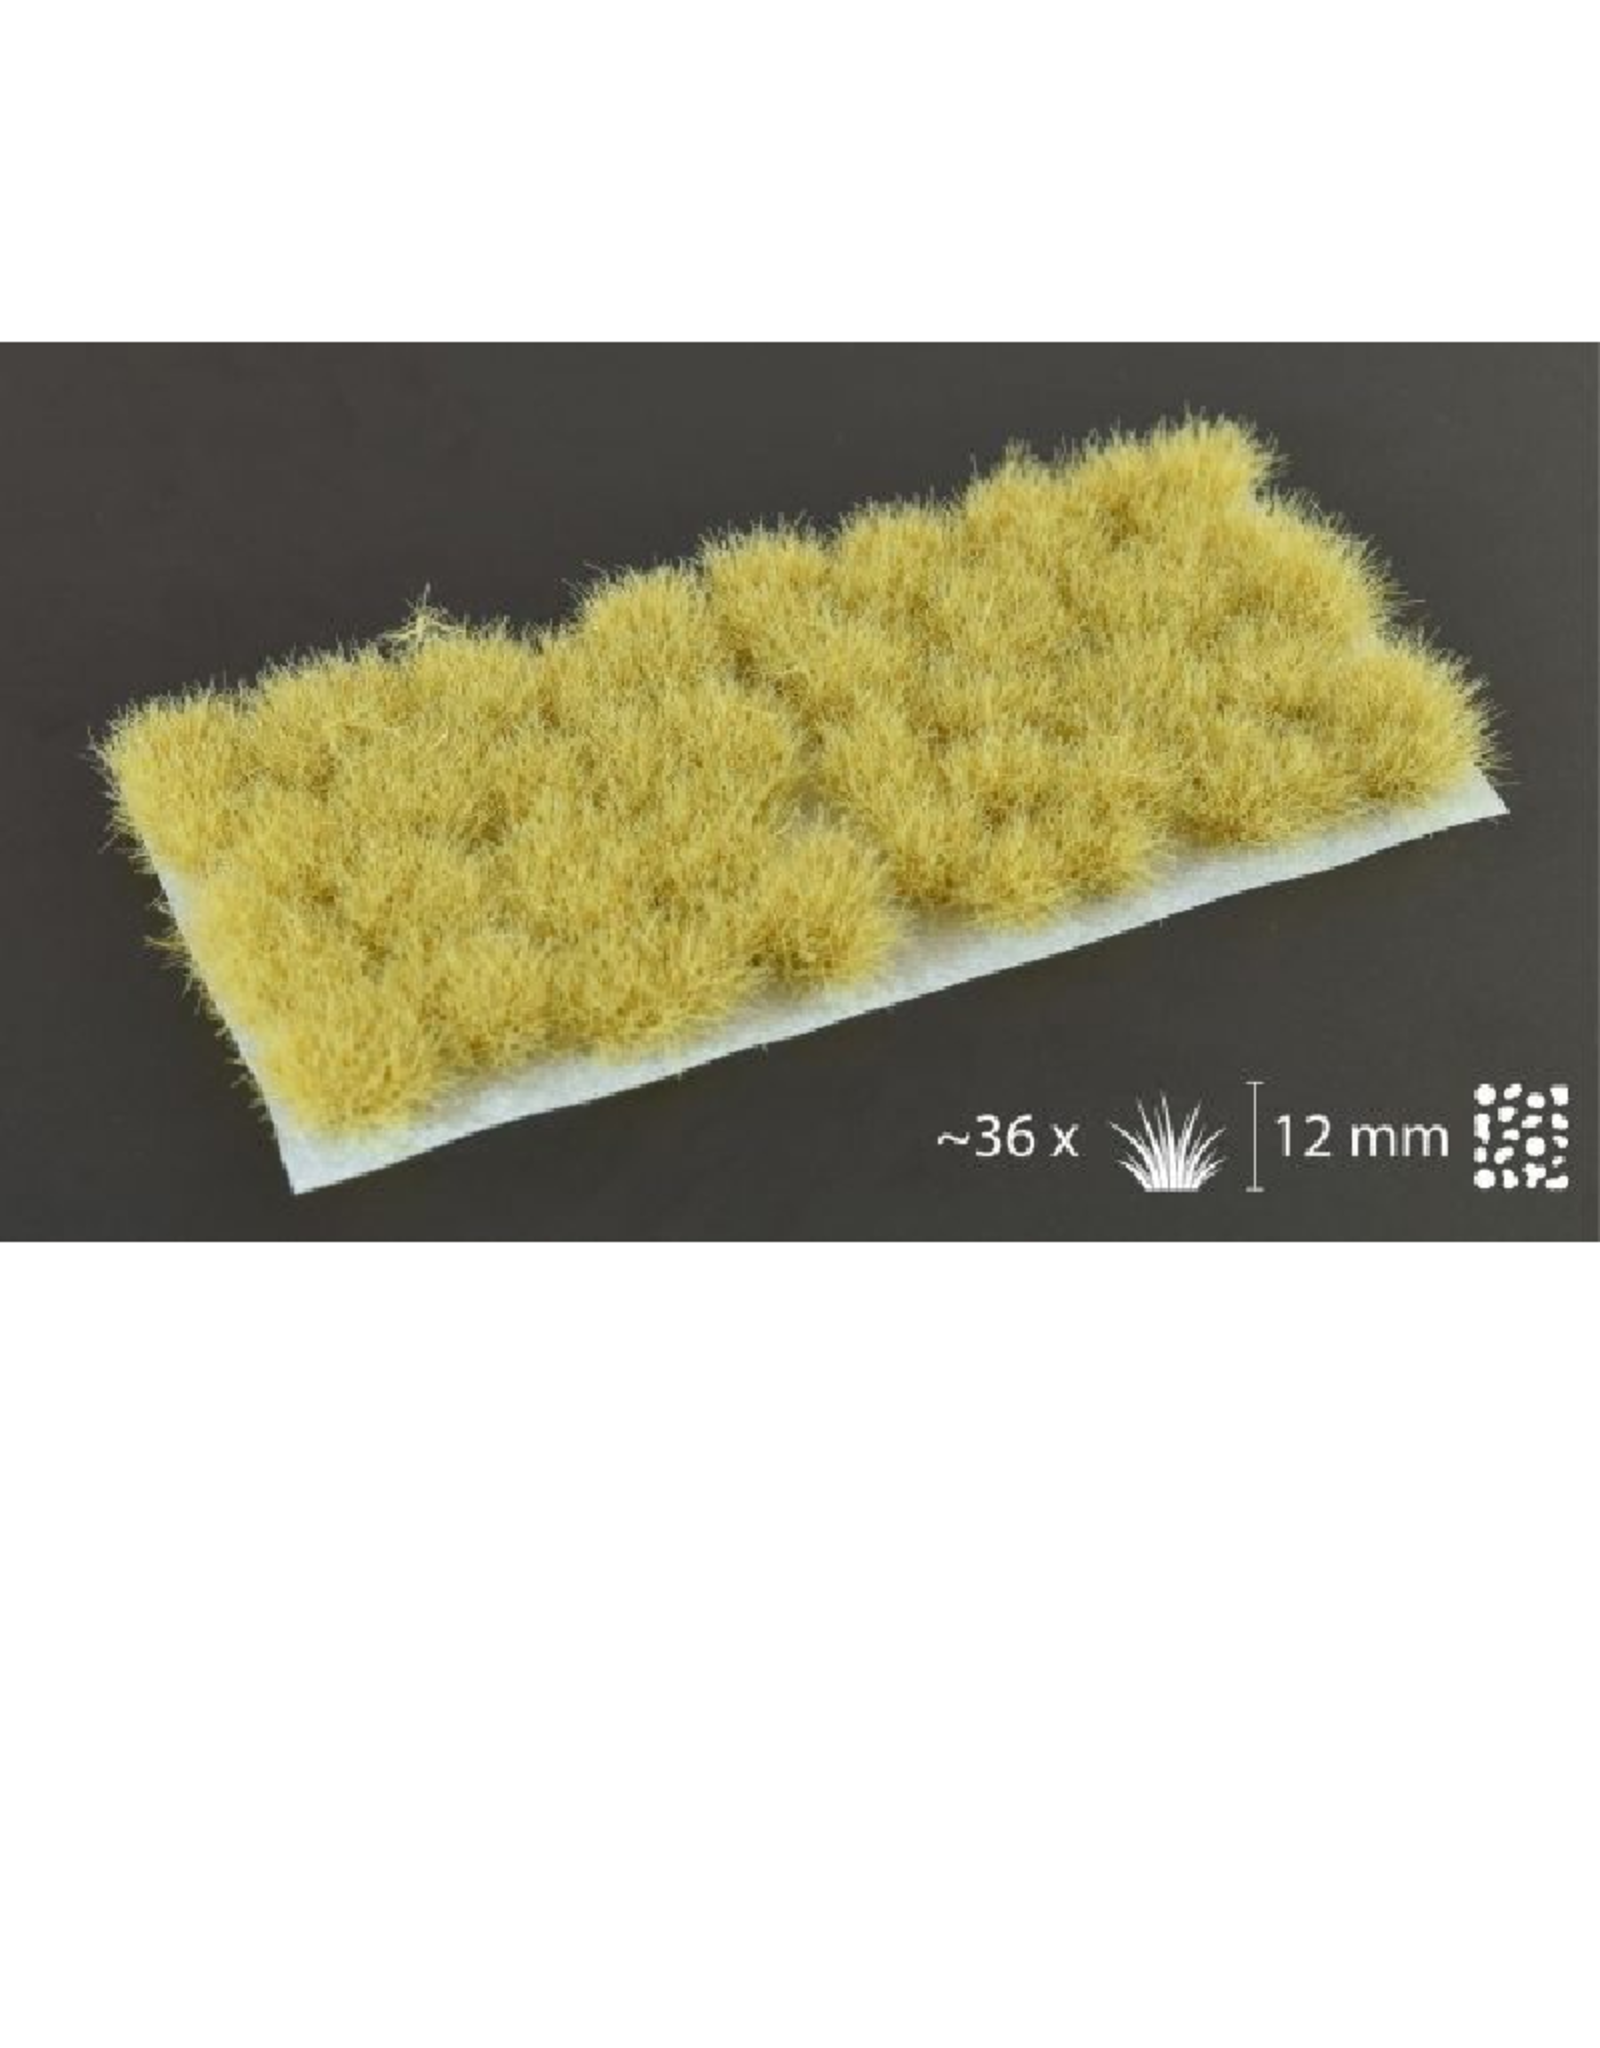 Gamers' Grass Beige Tufts (12mm, XL)